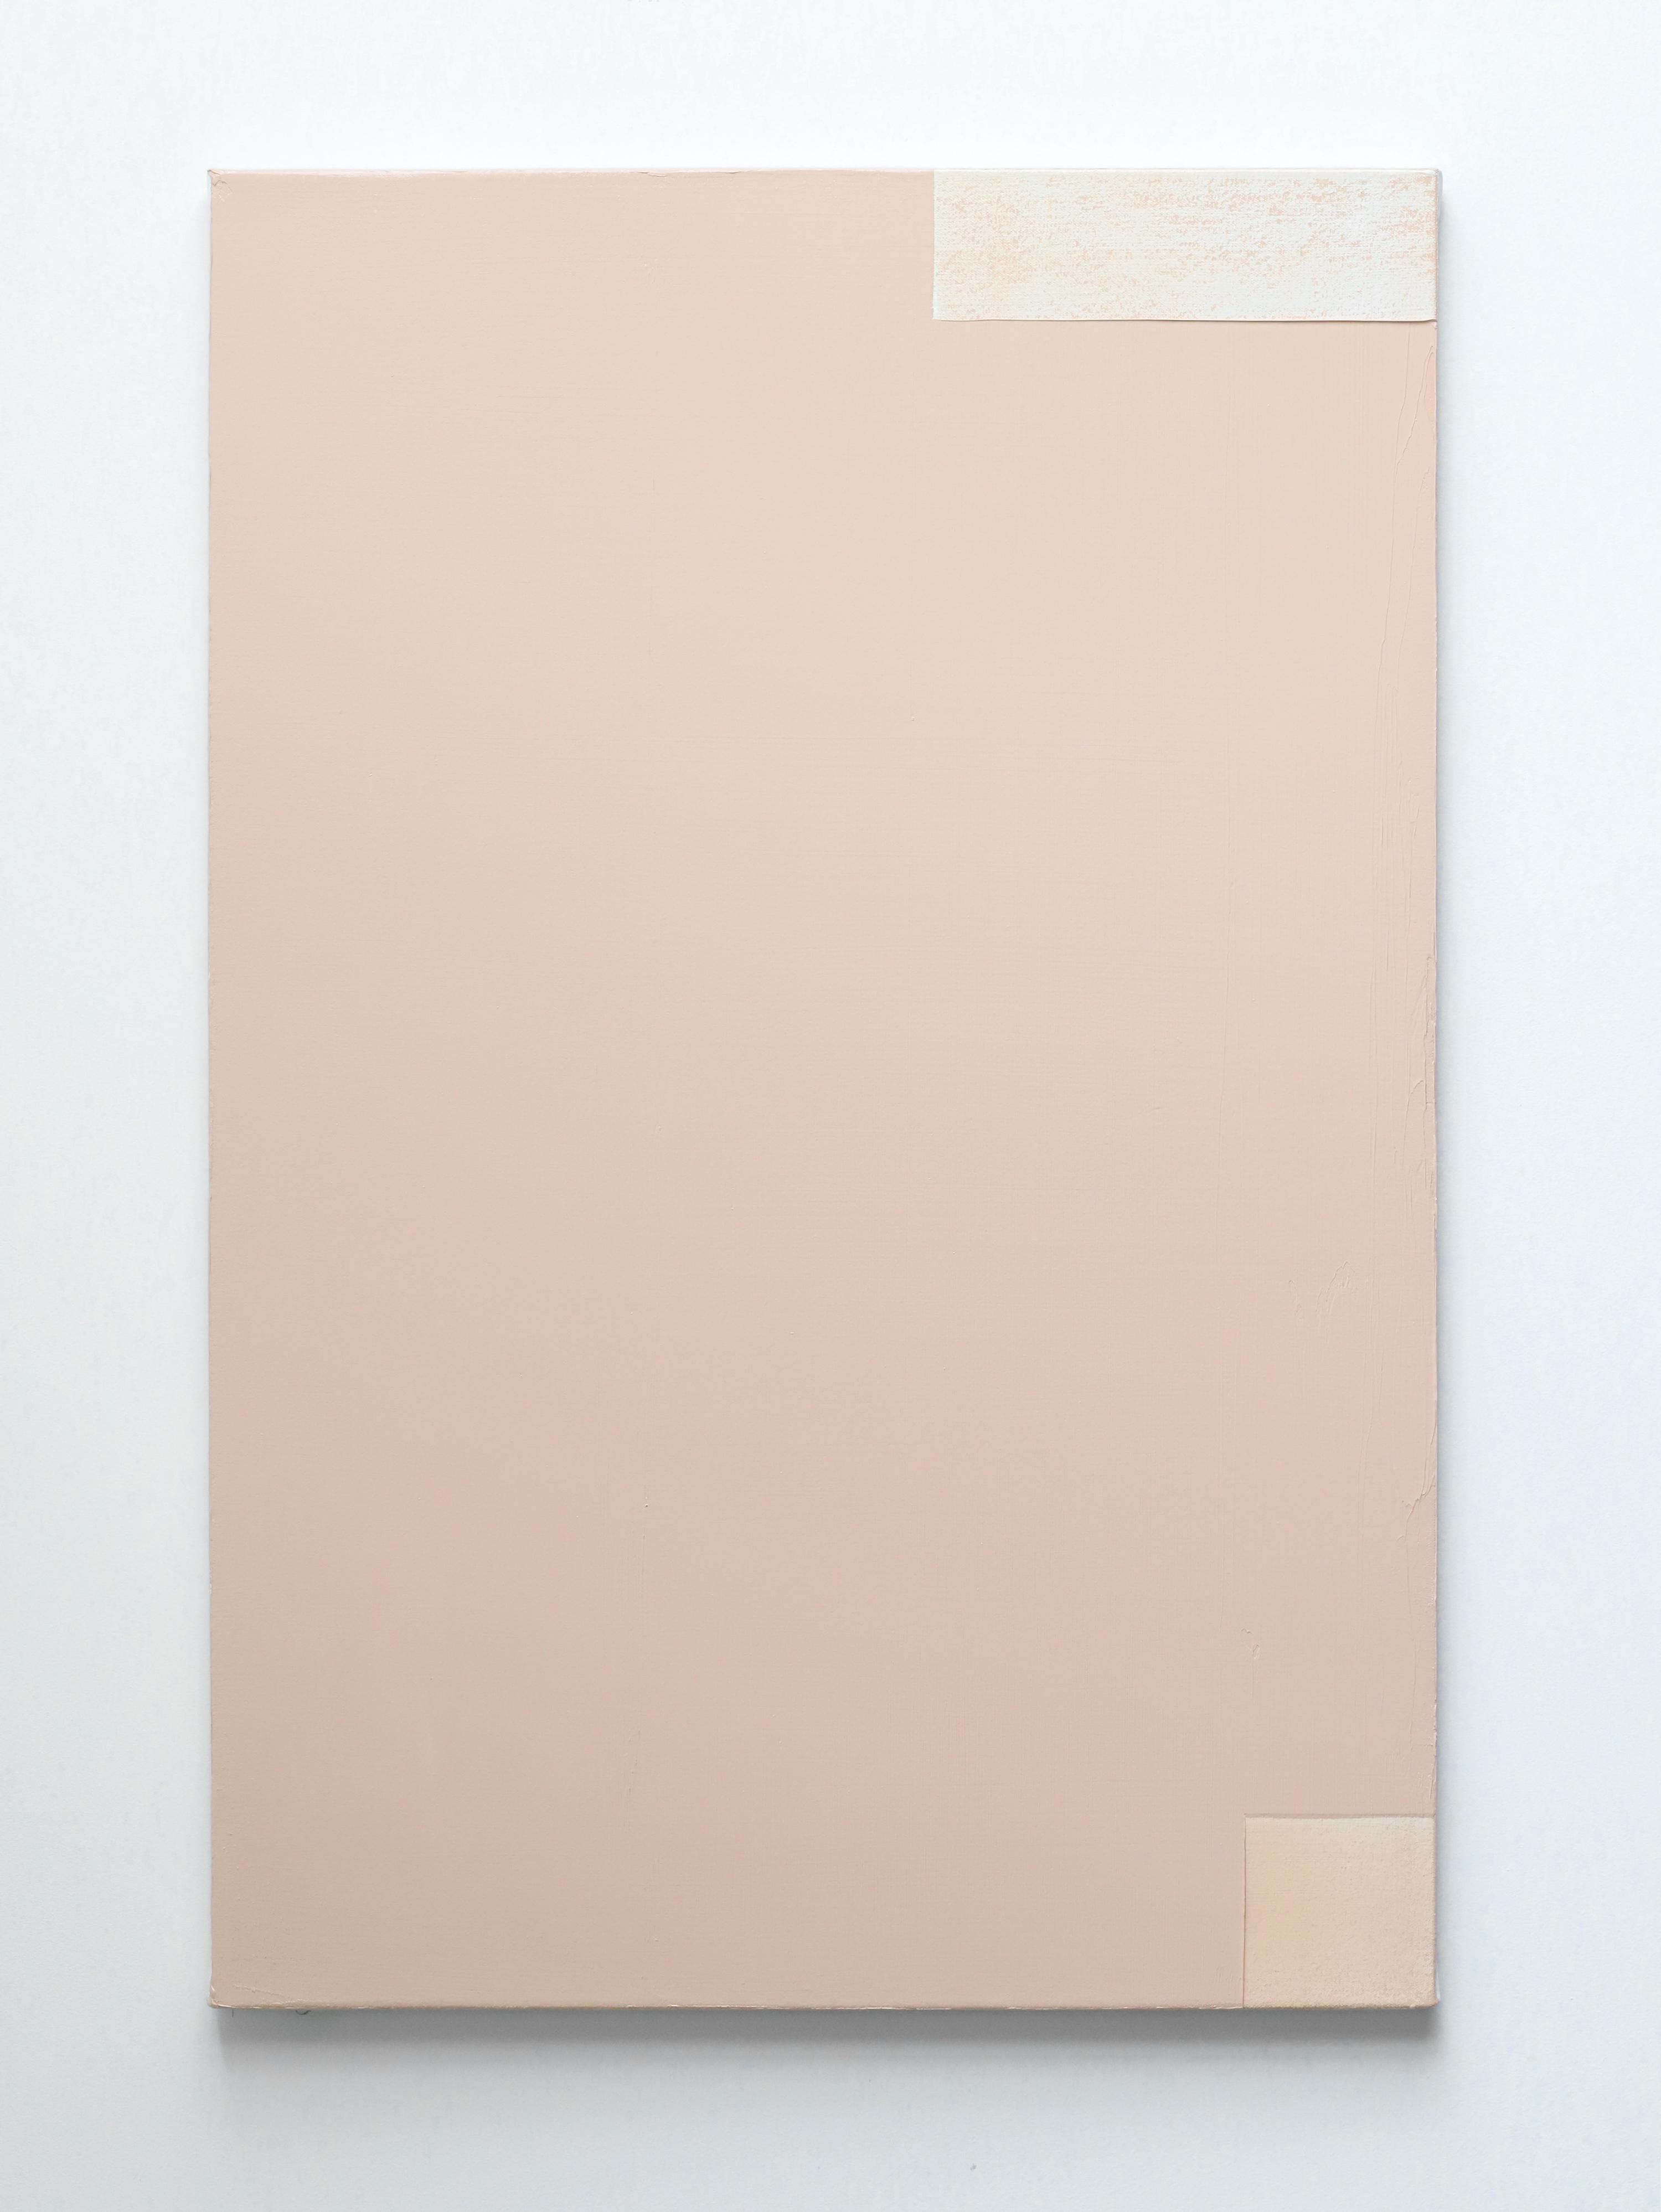 Contemporary minimalist oil painting by GJ Kimsunken 'Figuration 20.3' Beige